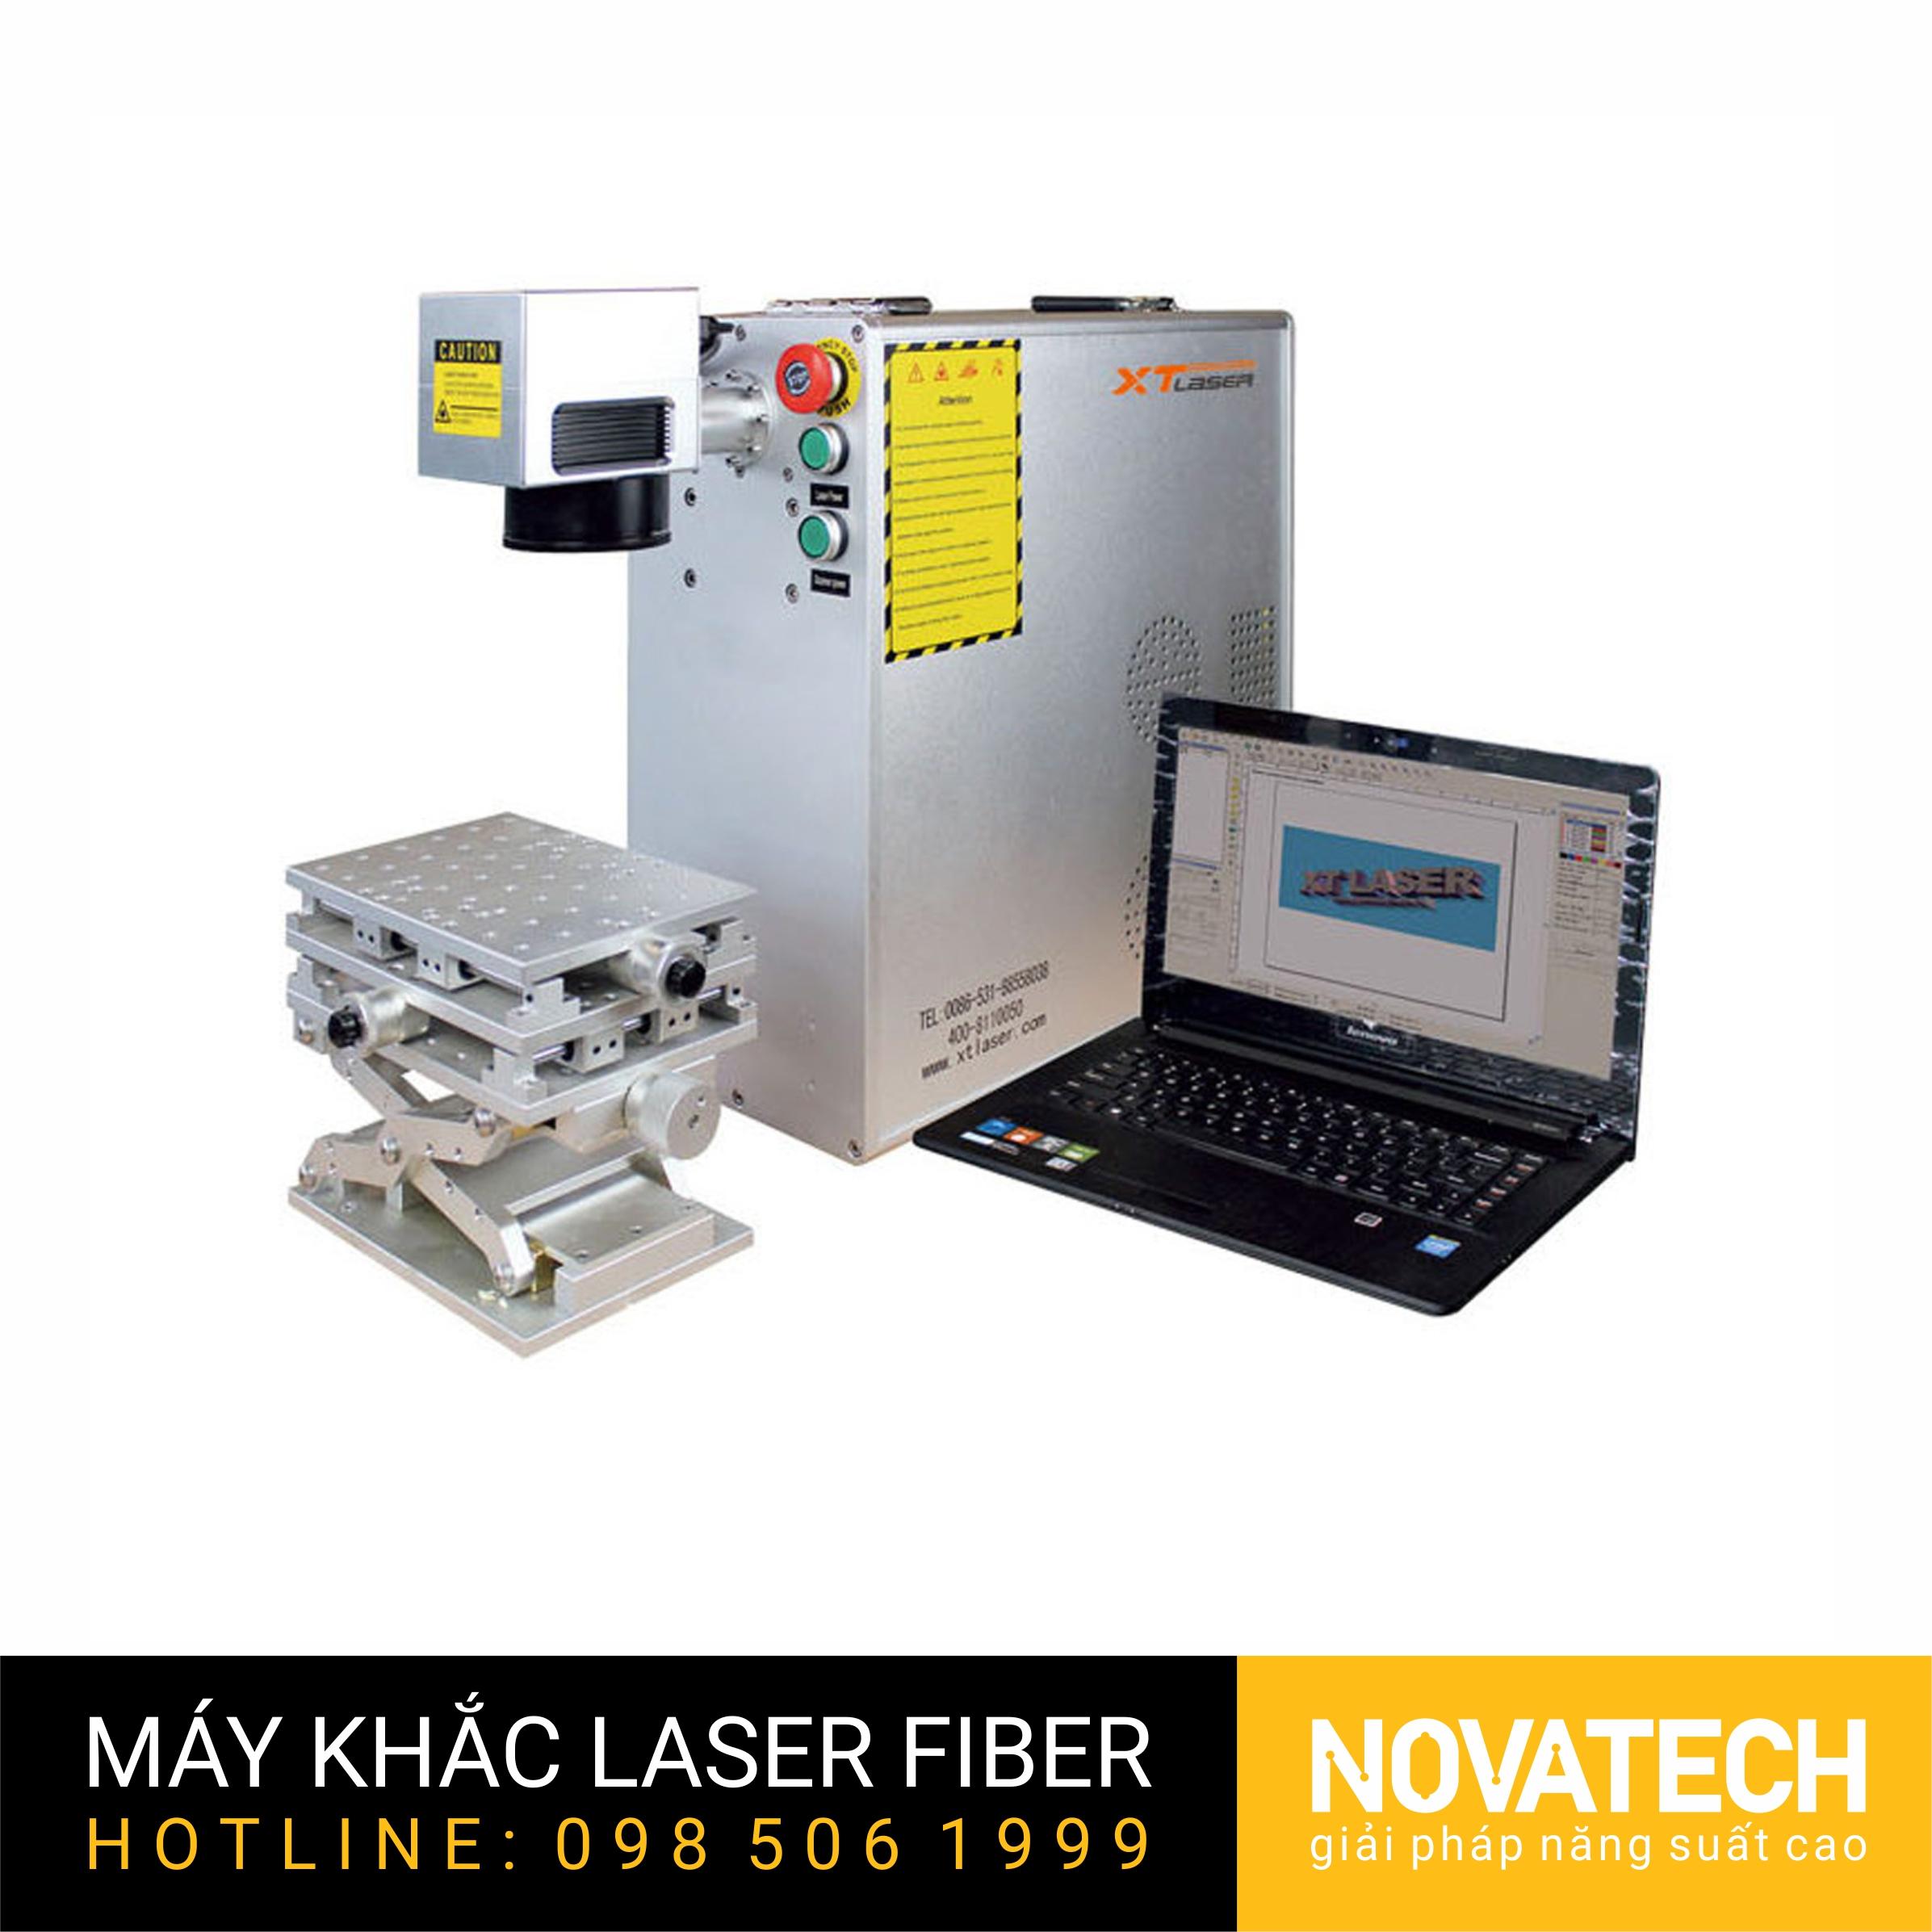 Máy khắc laser fiber 20W kiểu mini cơ động